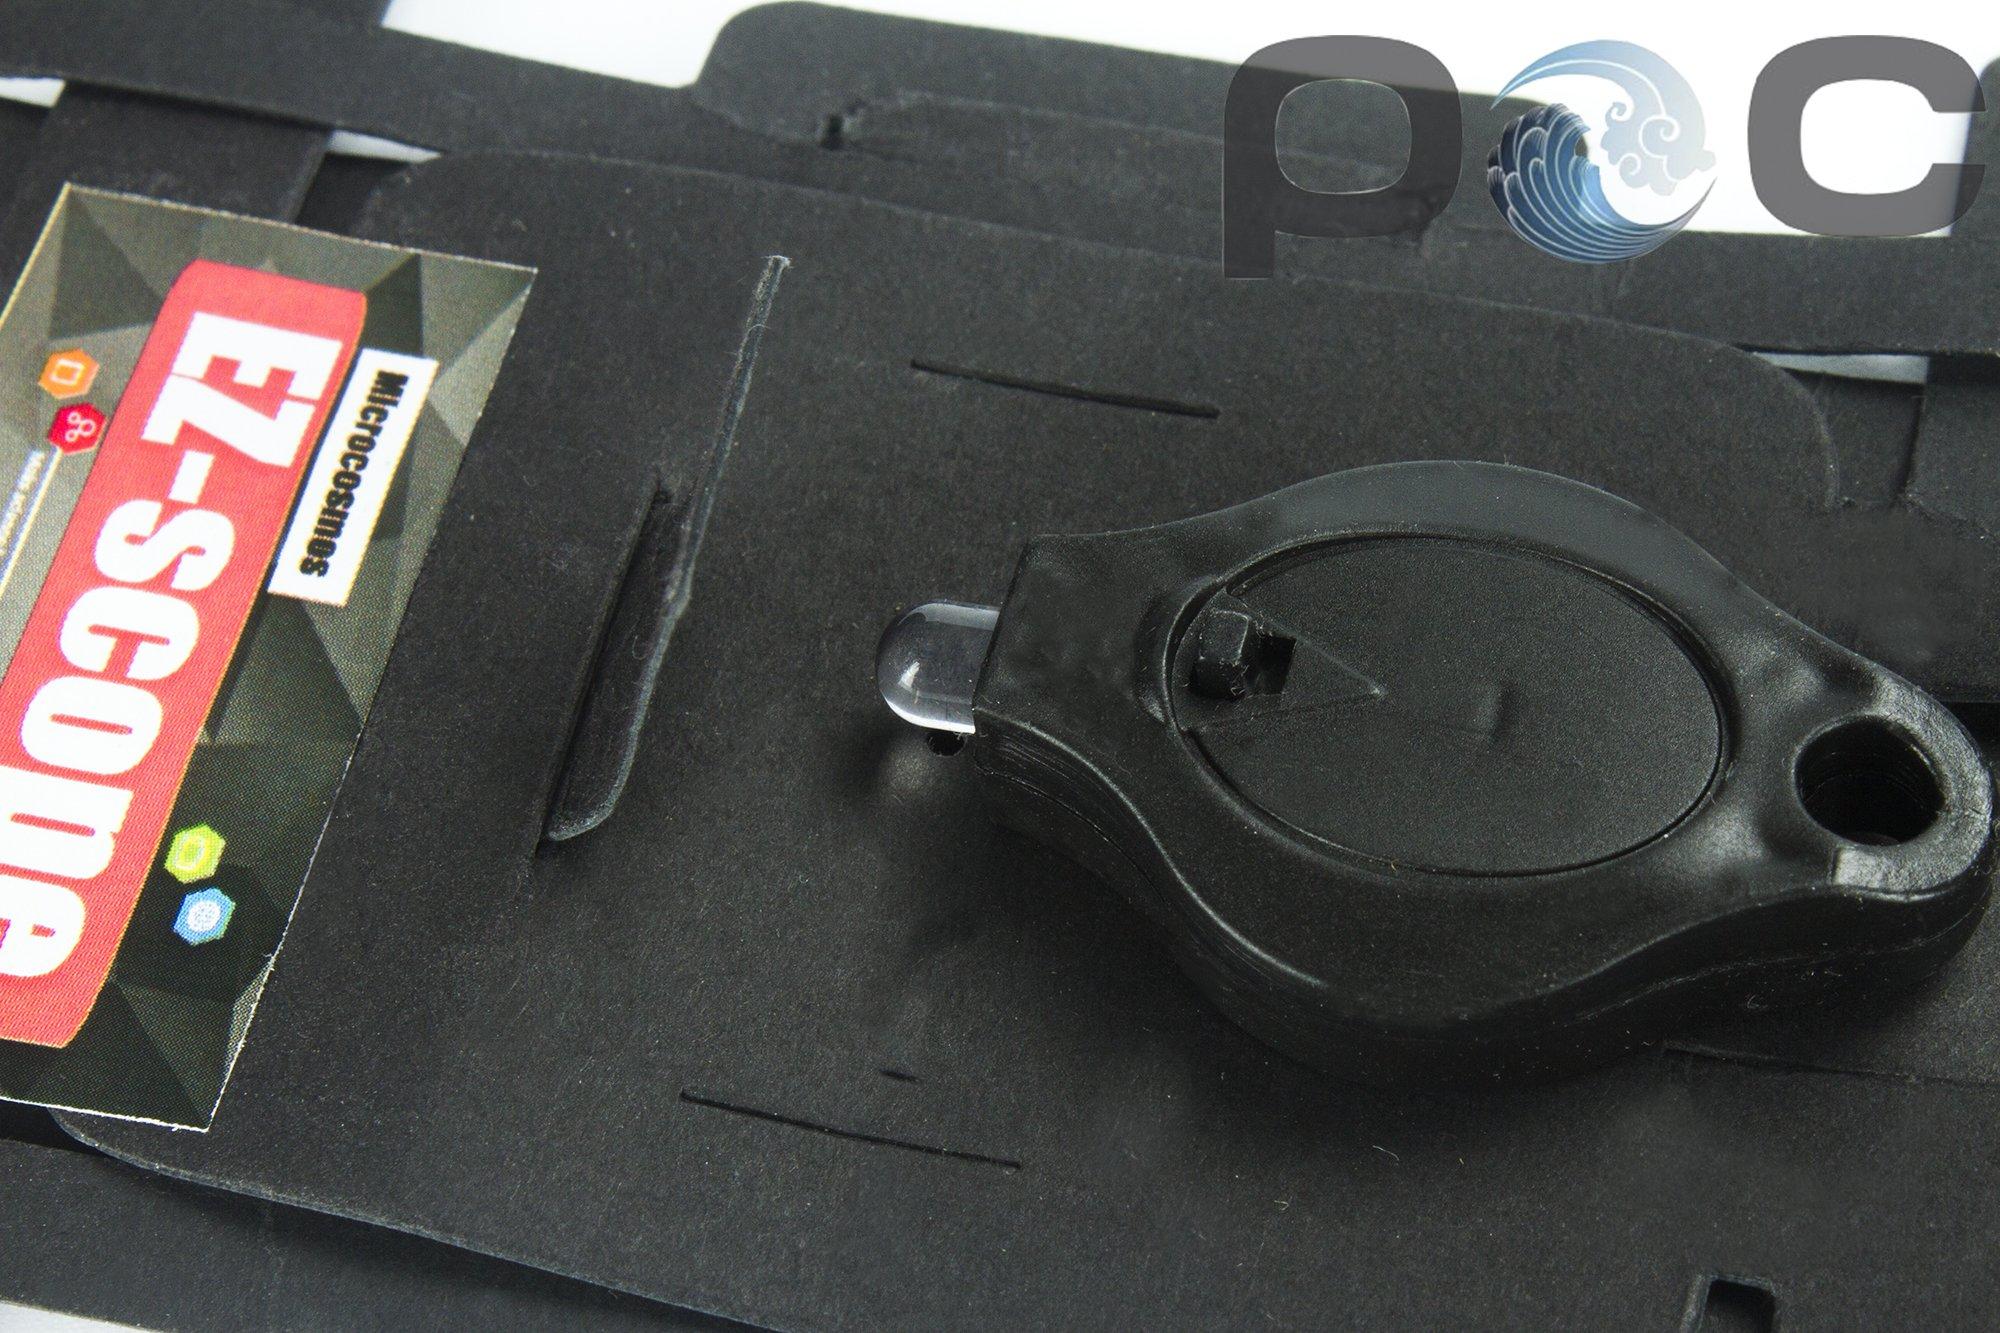 Lab LED mini colours paper microscope biological science outdoor pocket foldscope (color)